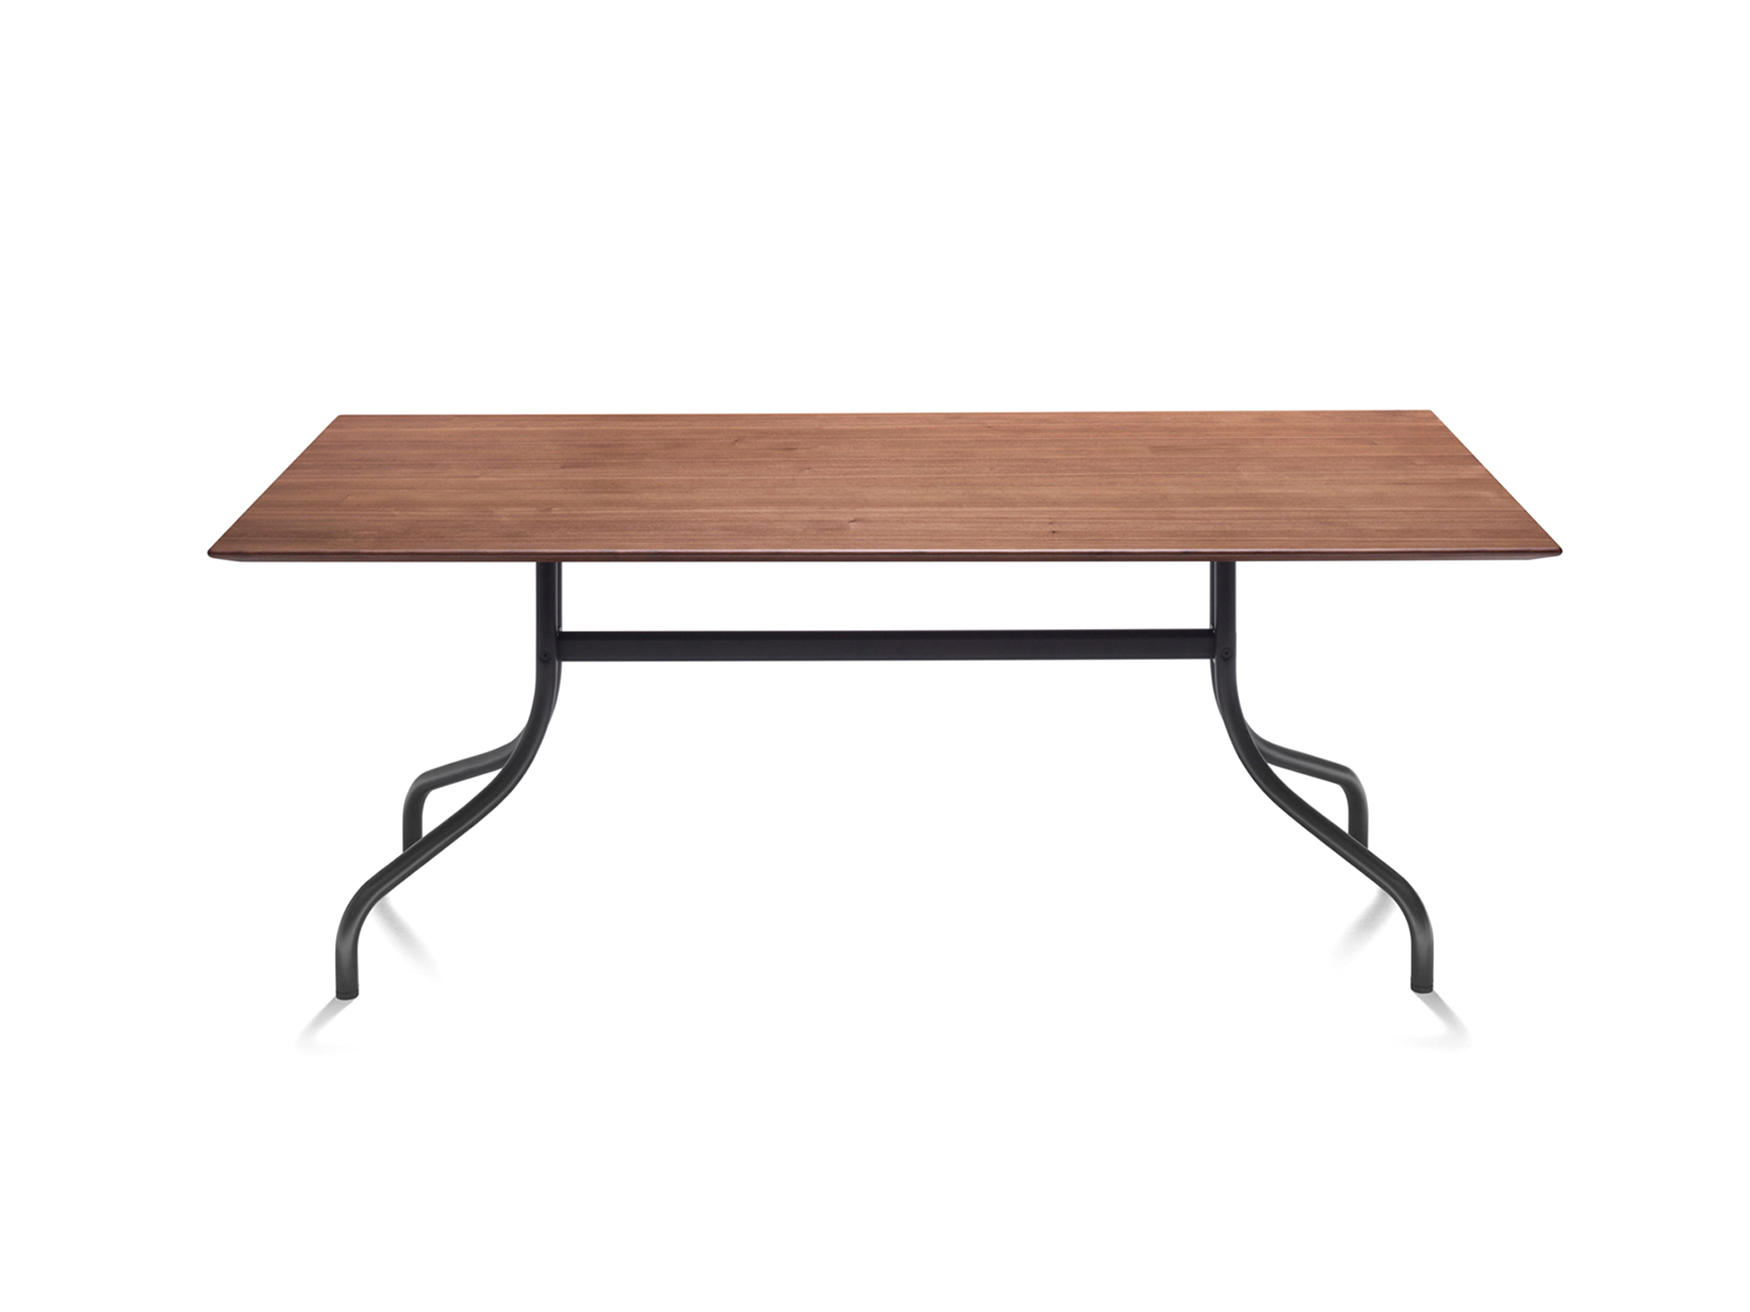 Tavolo De Padova Quadrato.Shine Table Dining Tables From De Padova Architonic